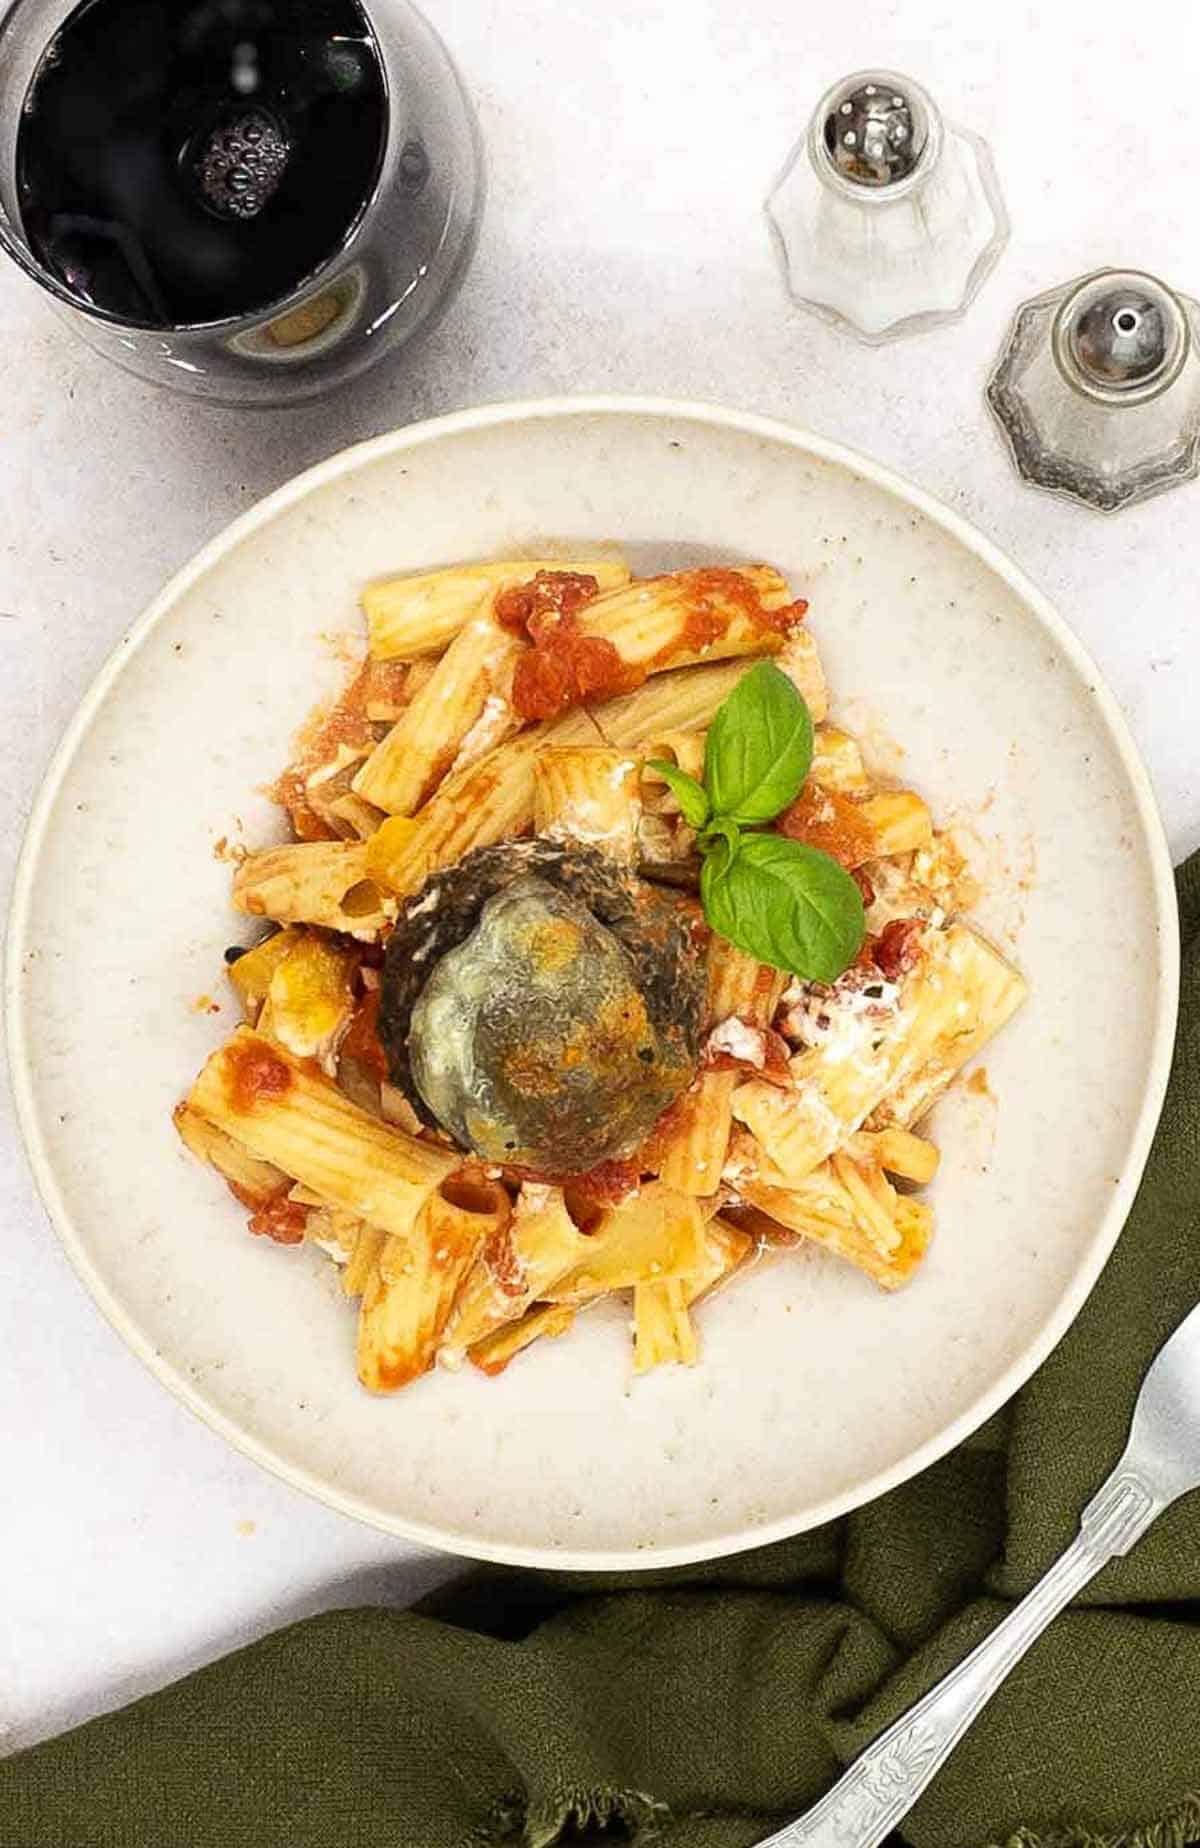 Veggie pasta bake with meatballs and rigatoni pasta.